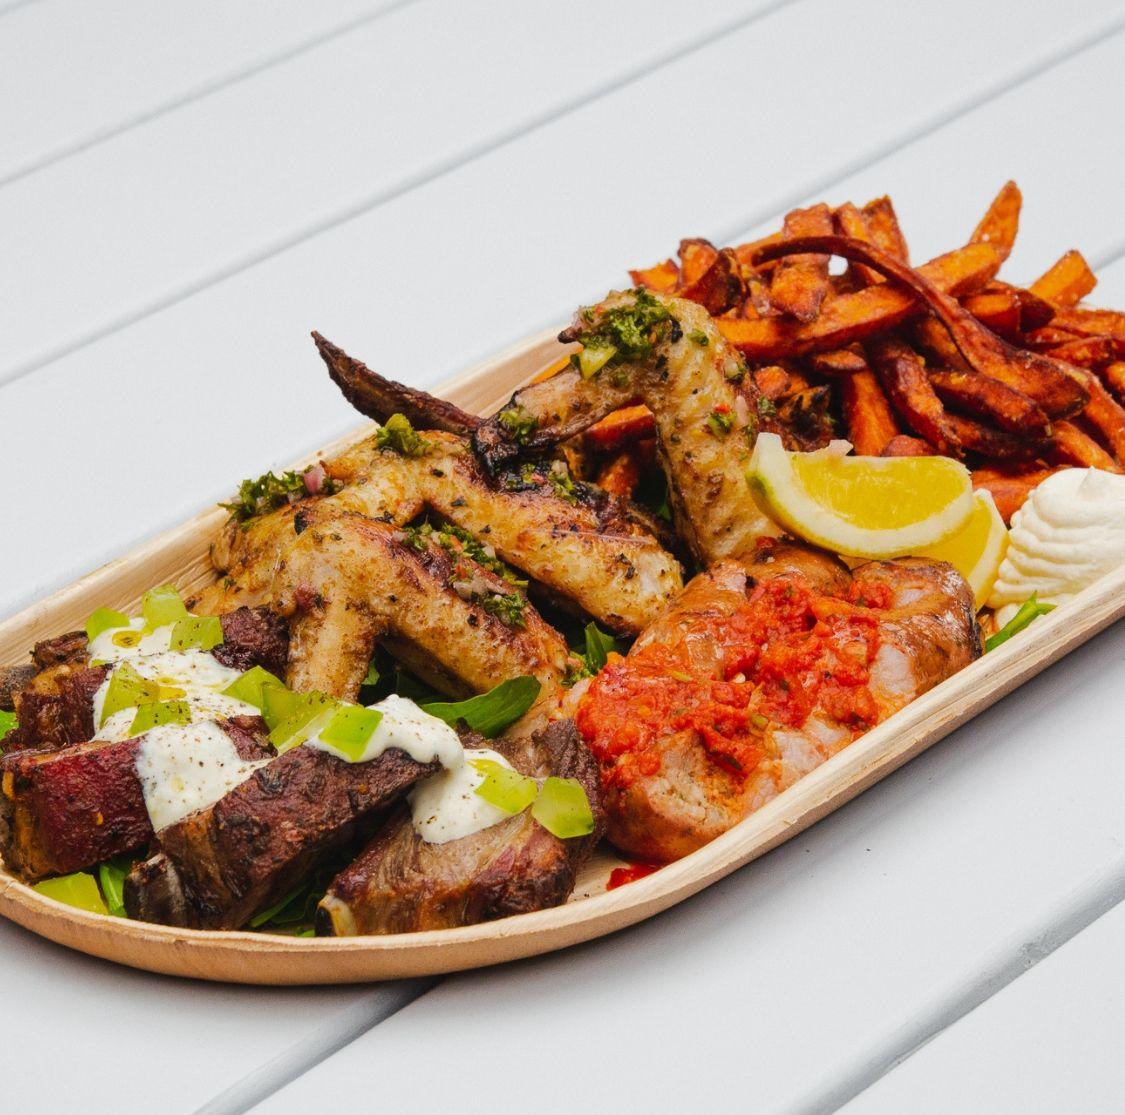 Mar and Tierra Platter - Chorizo, lamb ribs, chicken wings and kumara chips